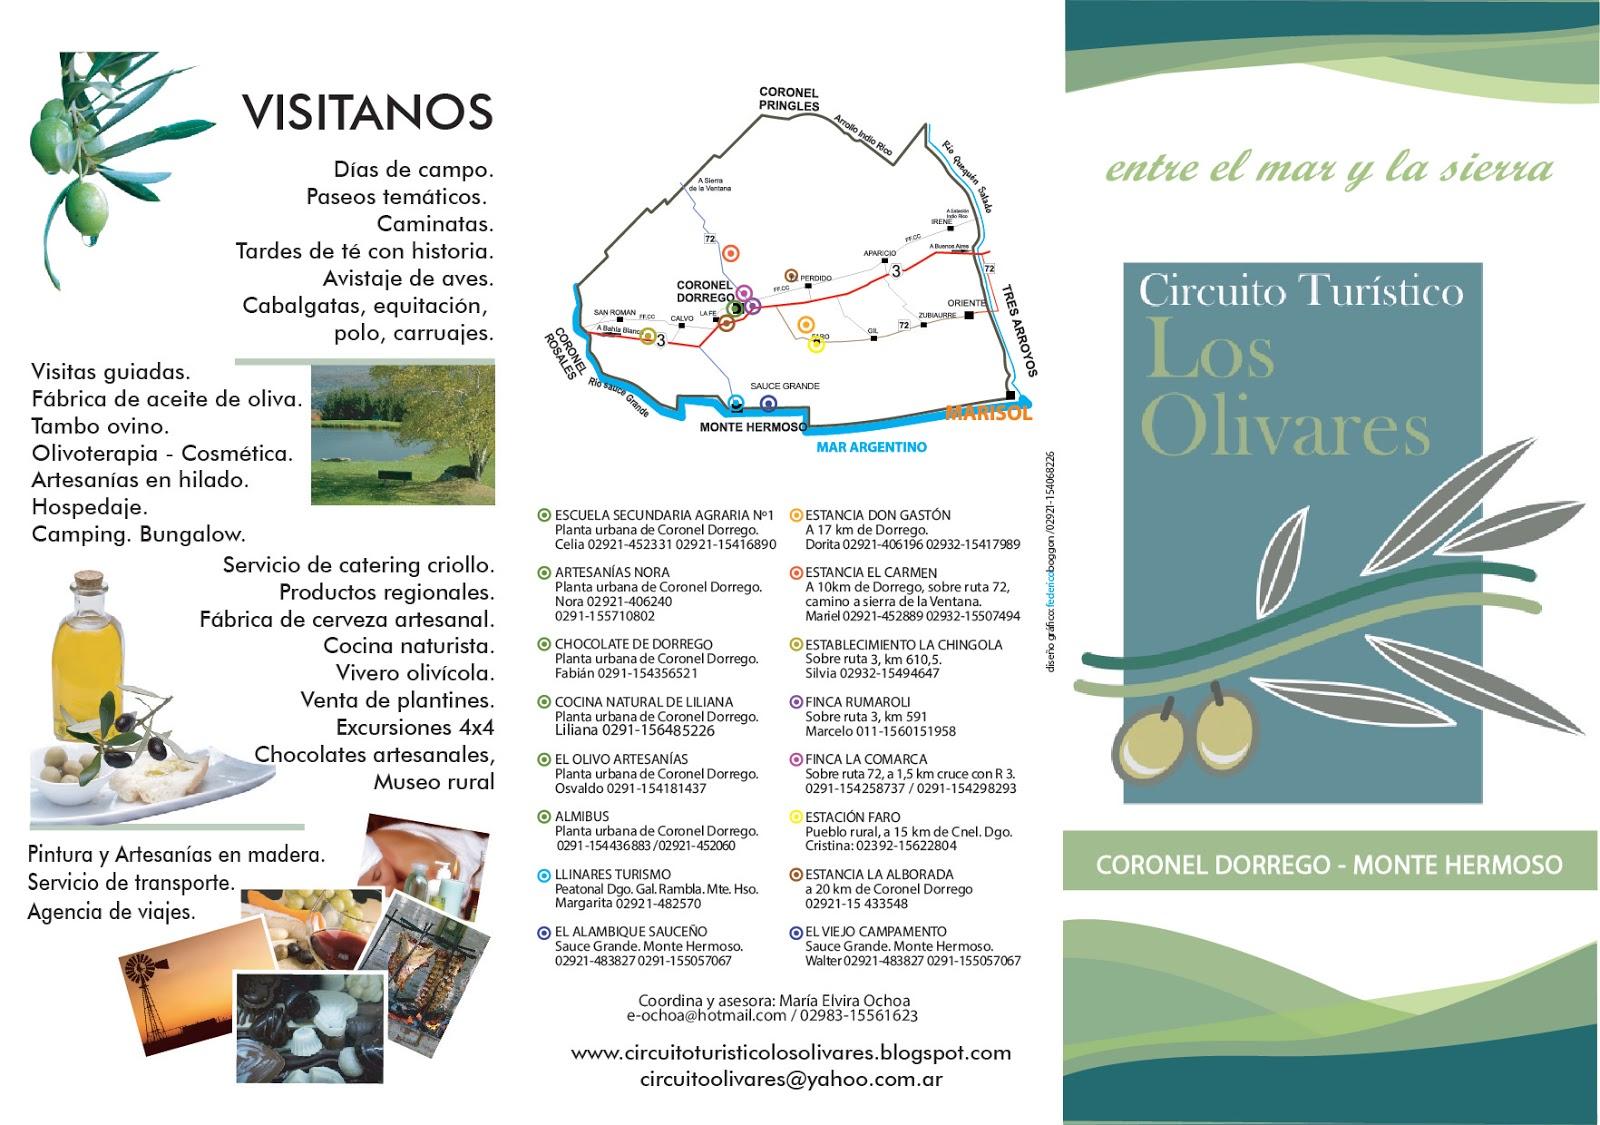 Circuito Turistico : Ruta en la patagonia argentina turismo circuito turistico